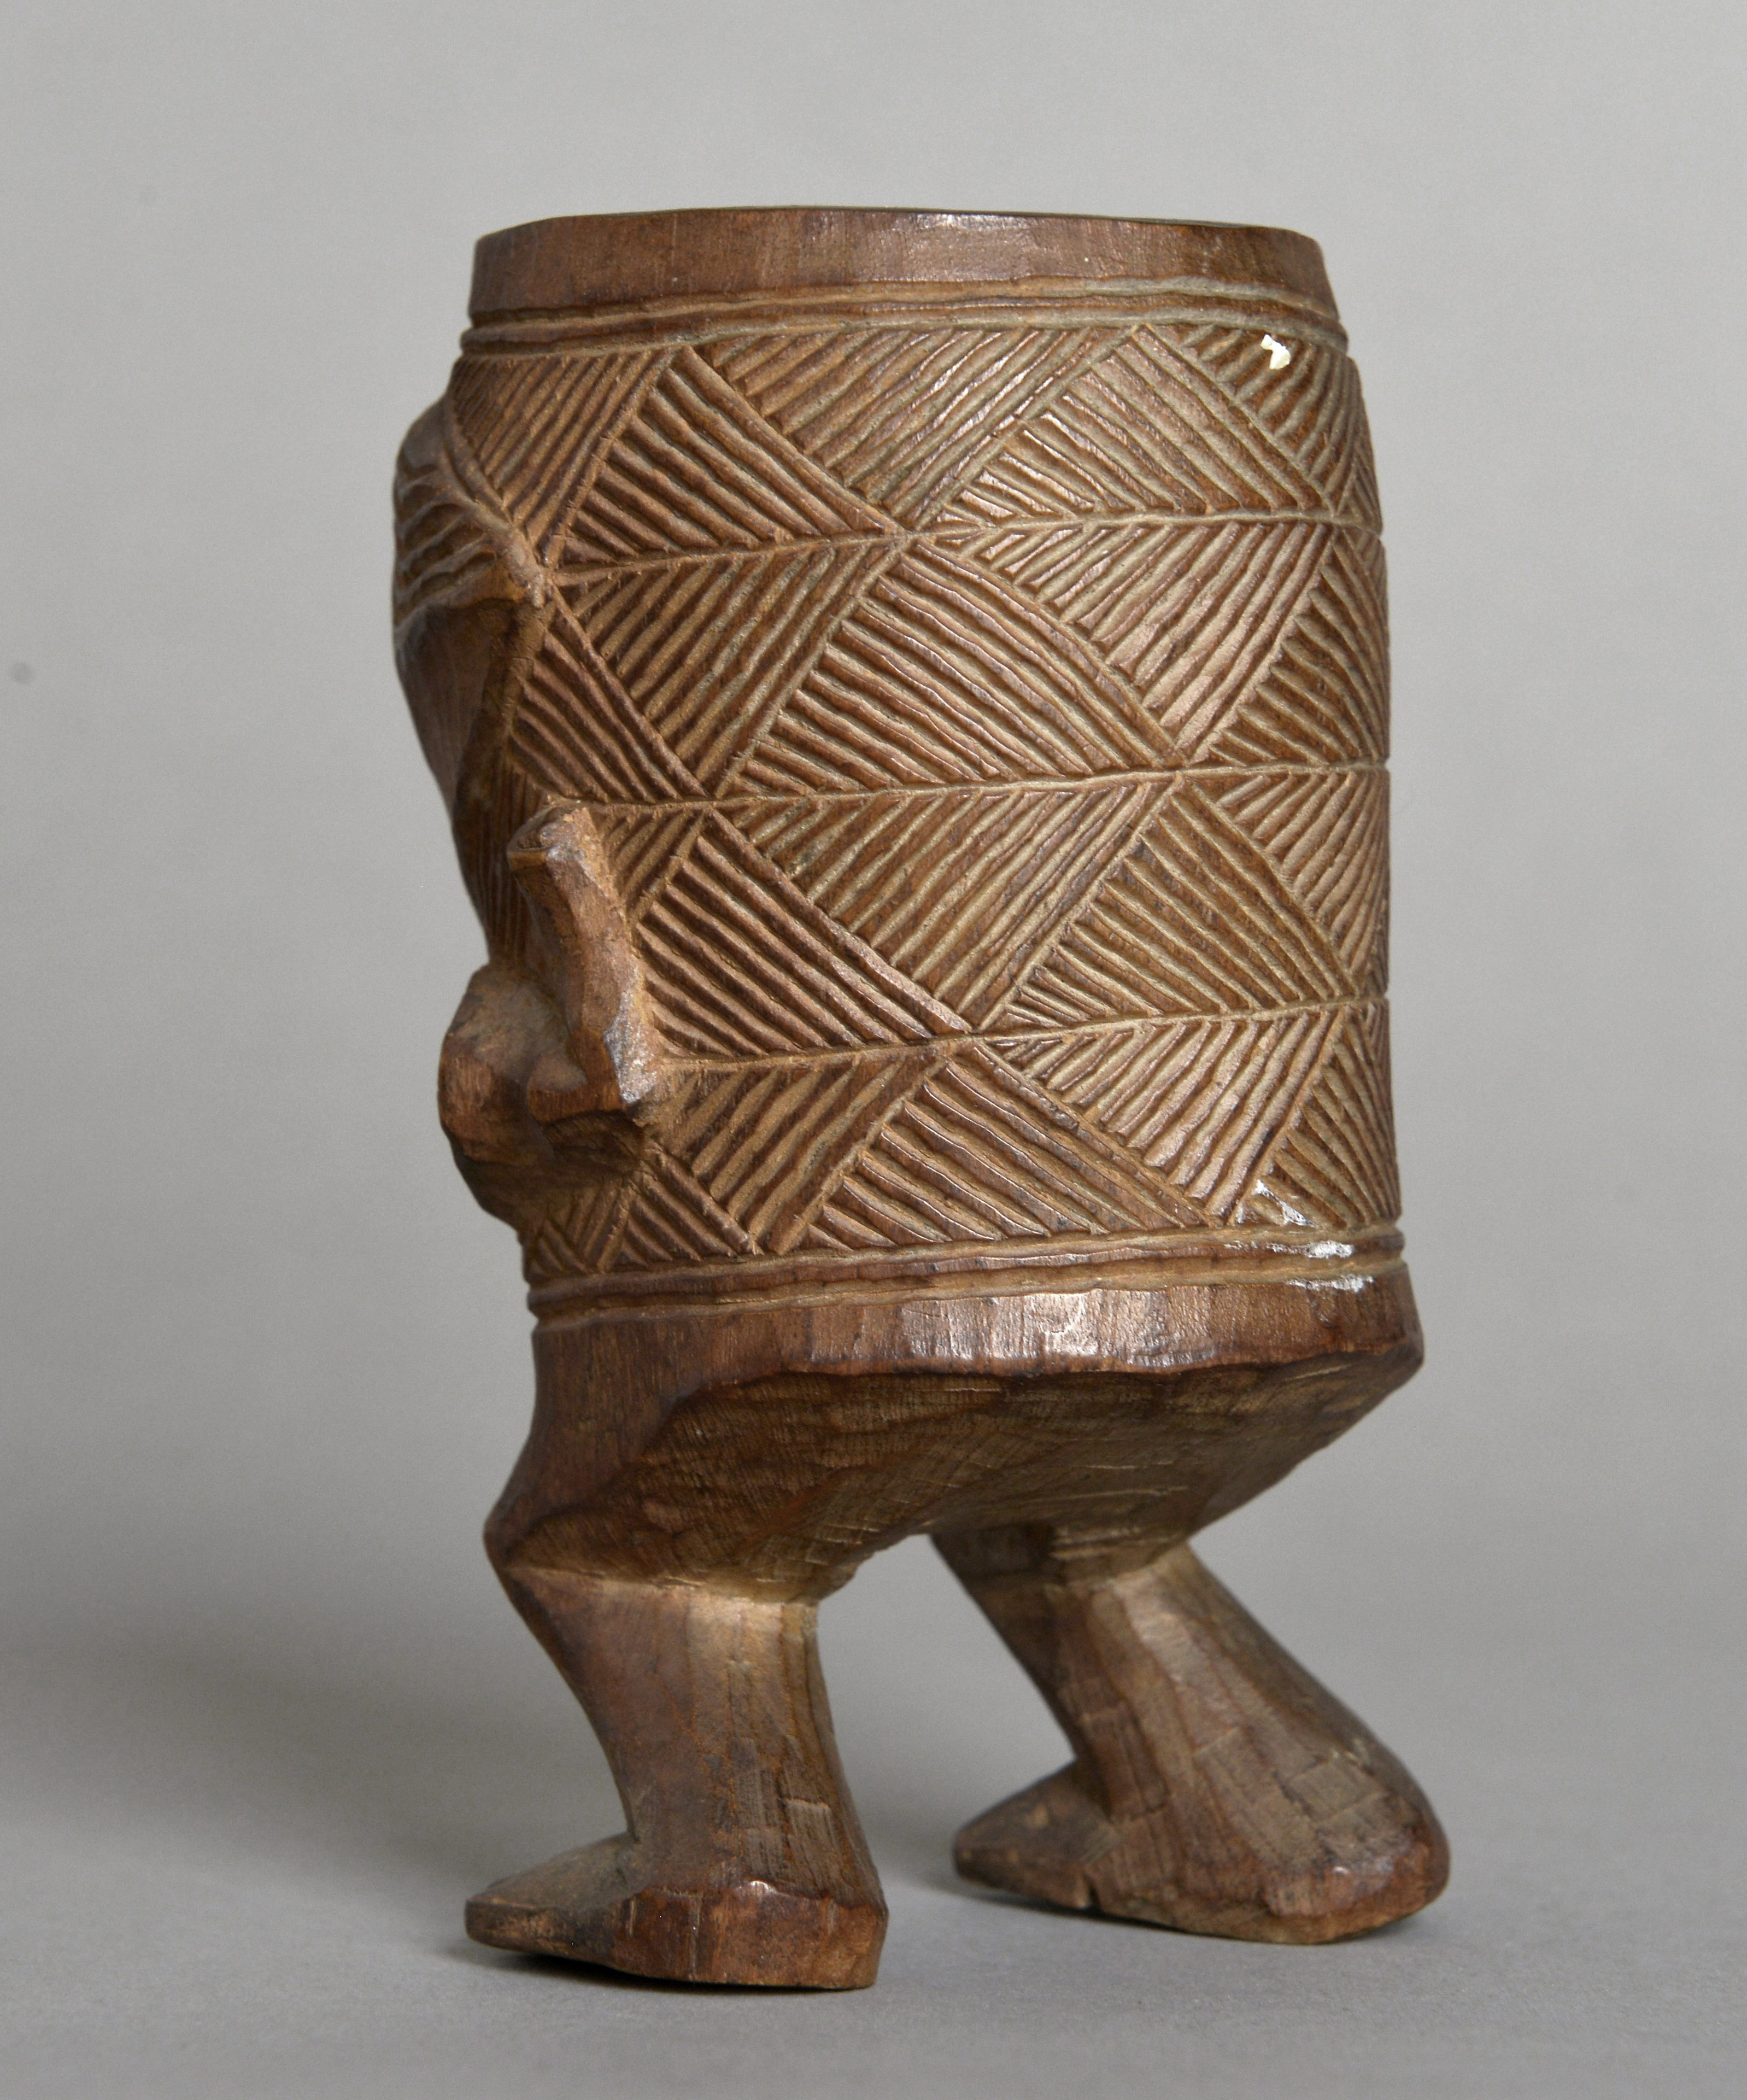 Pende palmwine cup